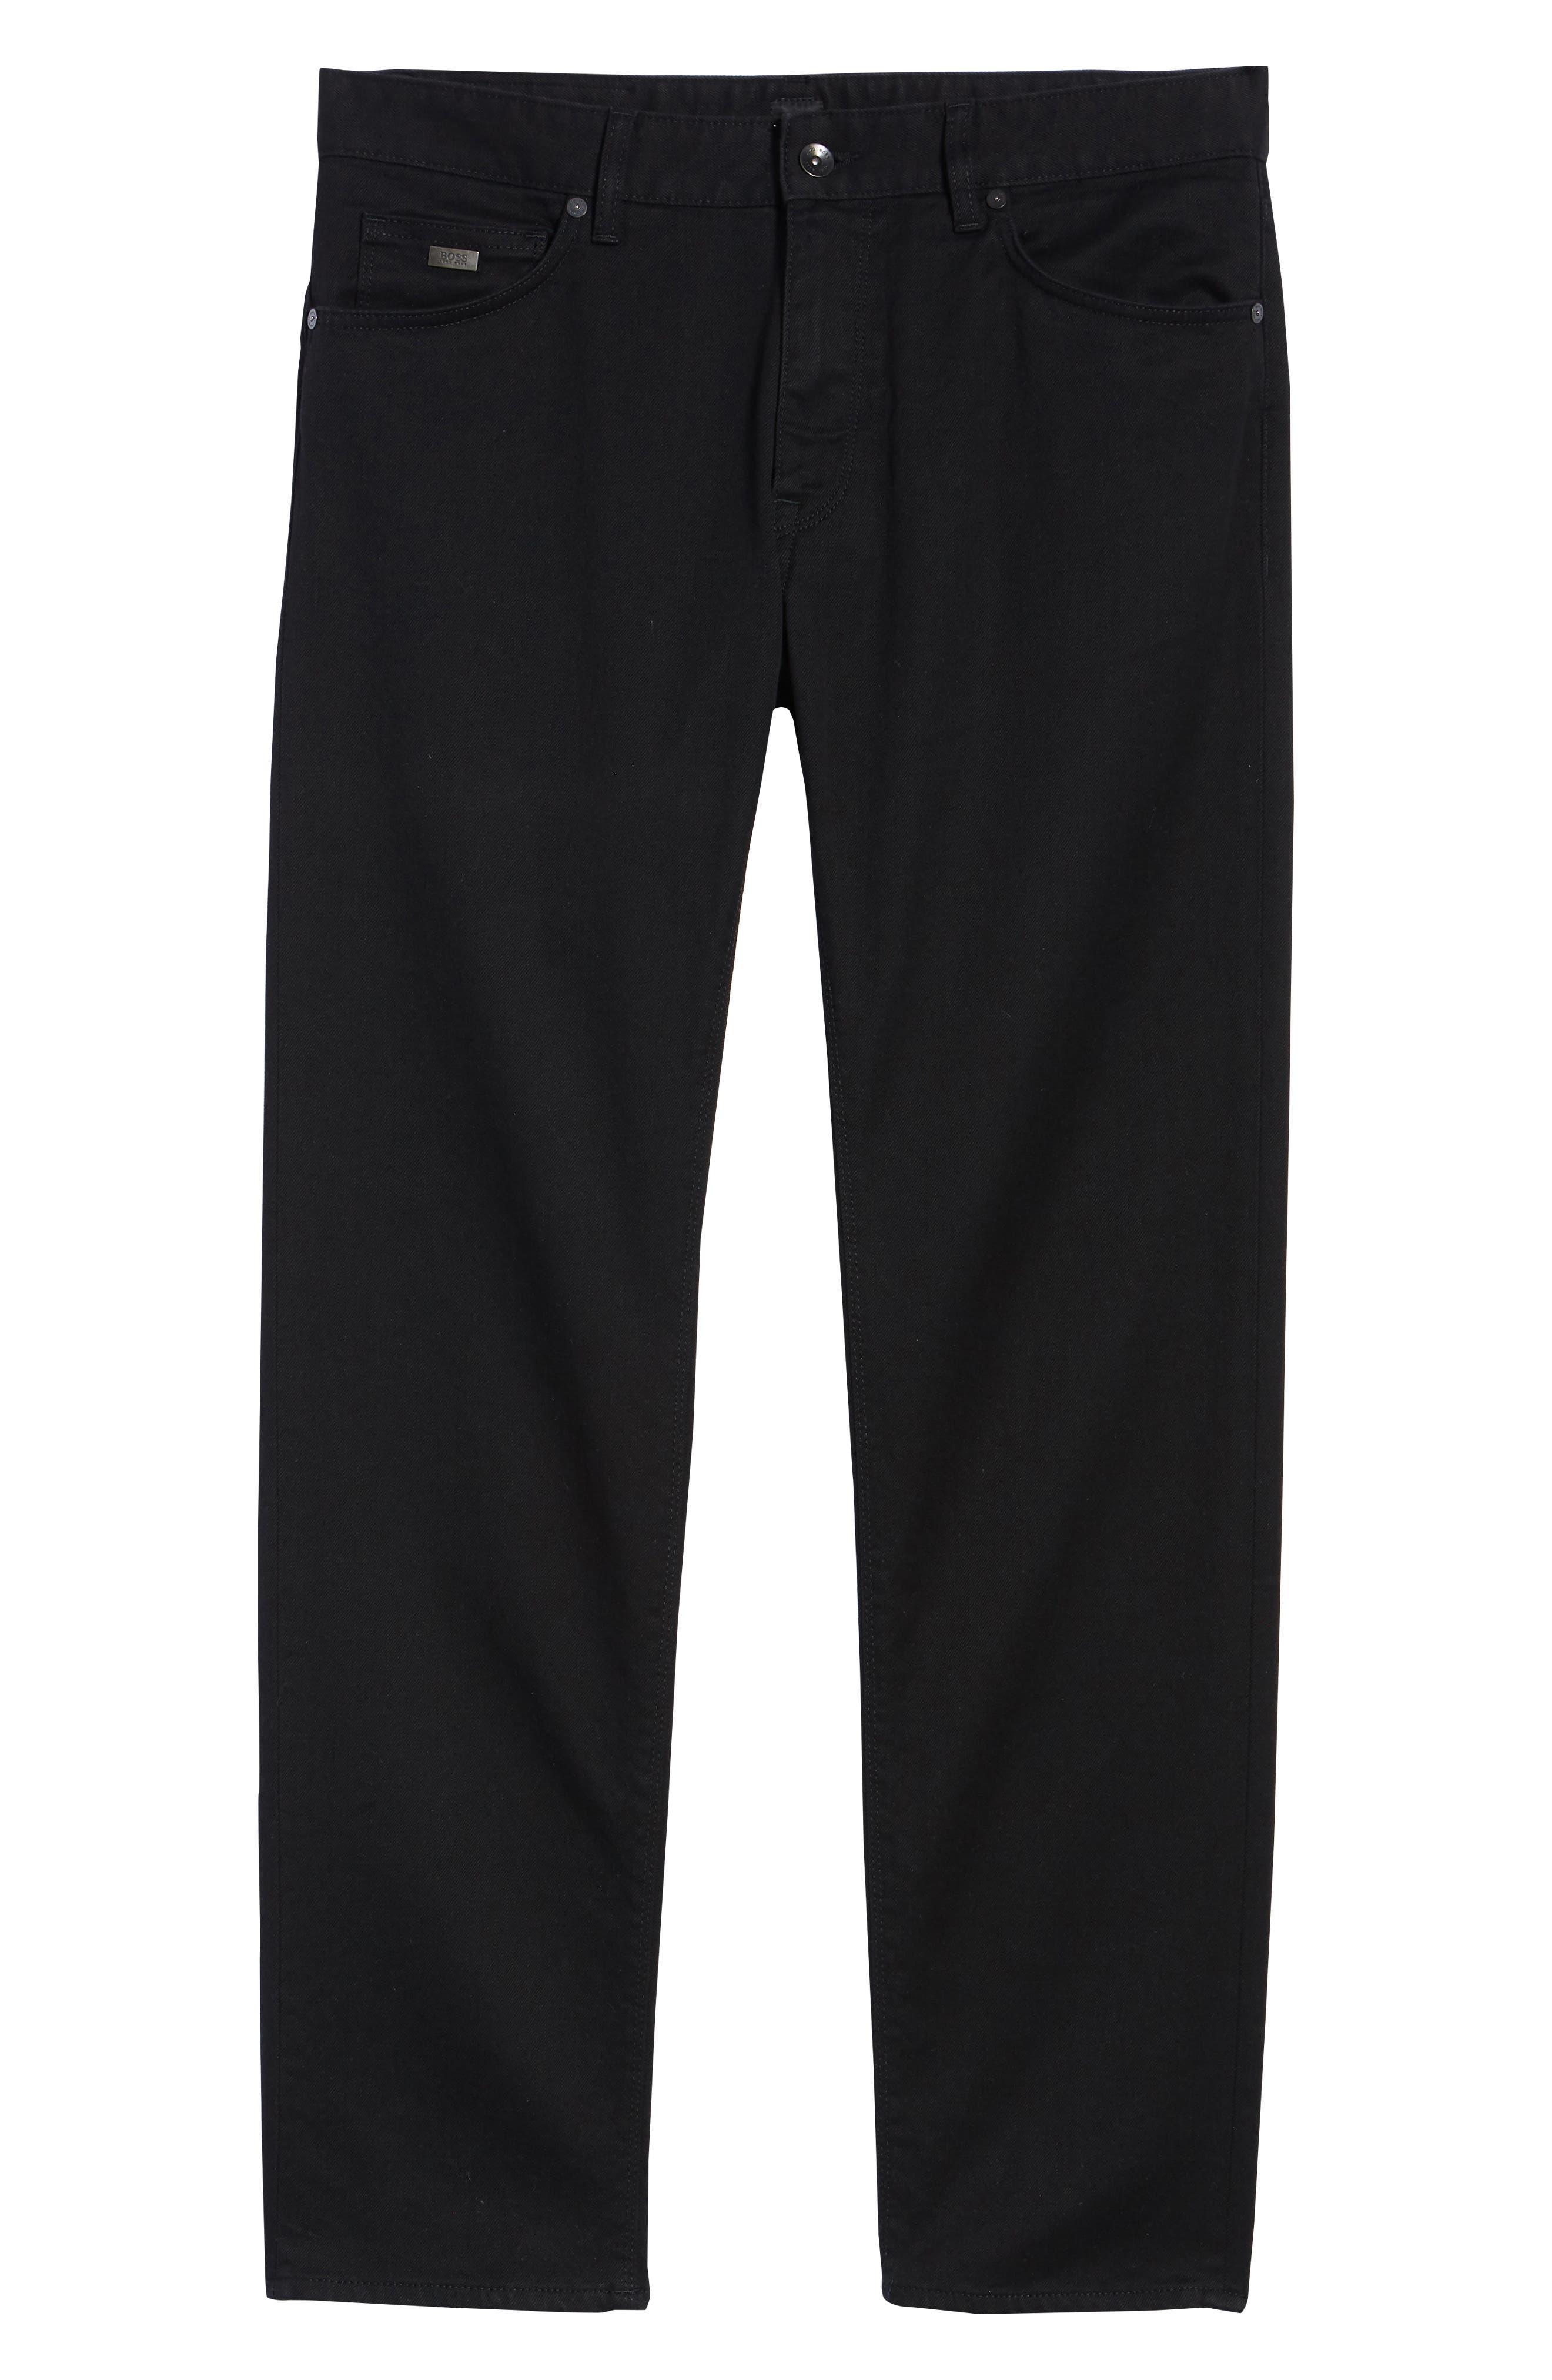 Maine Straight Leg Jeans,                             Alternate thumbnail 6, color,                             002